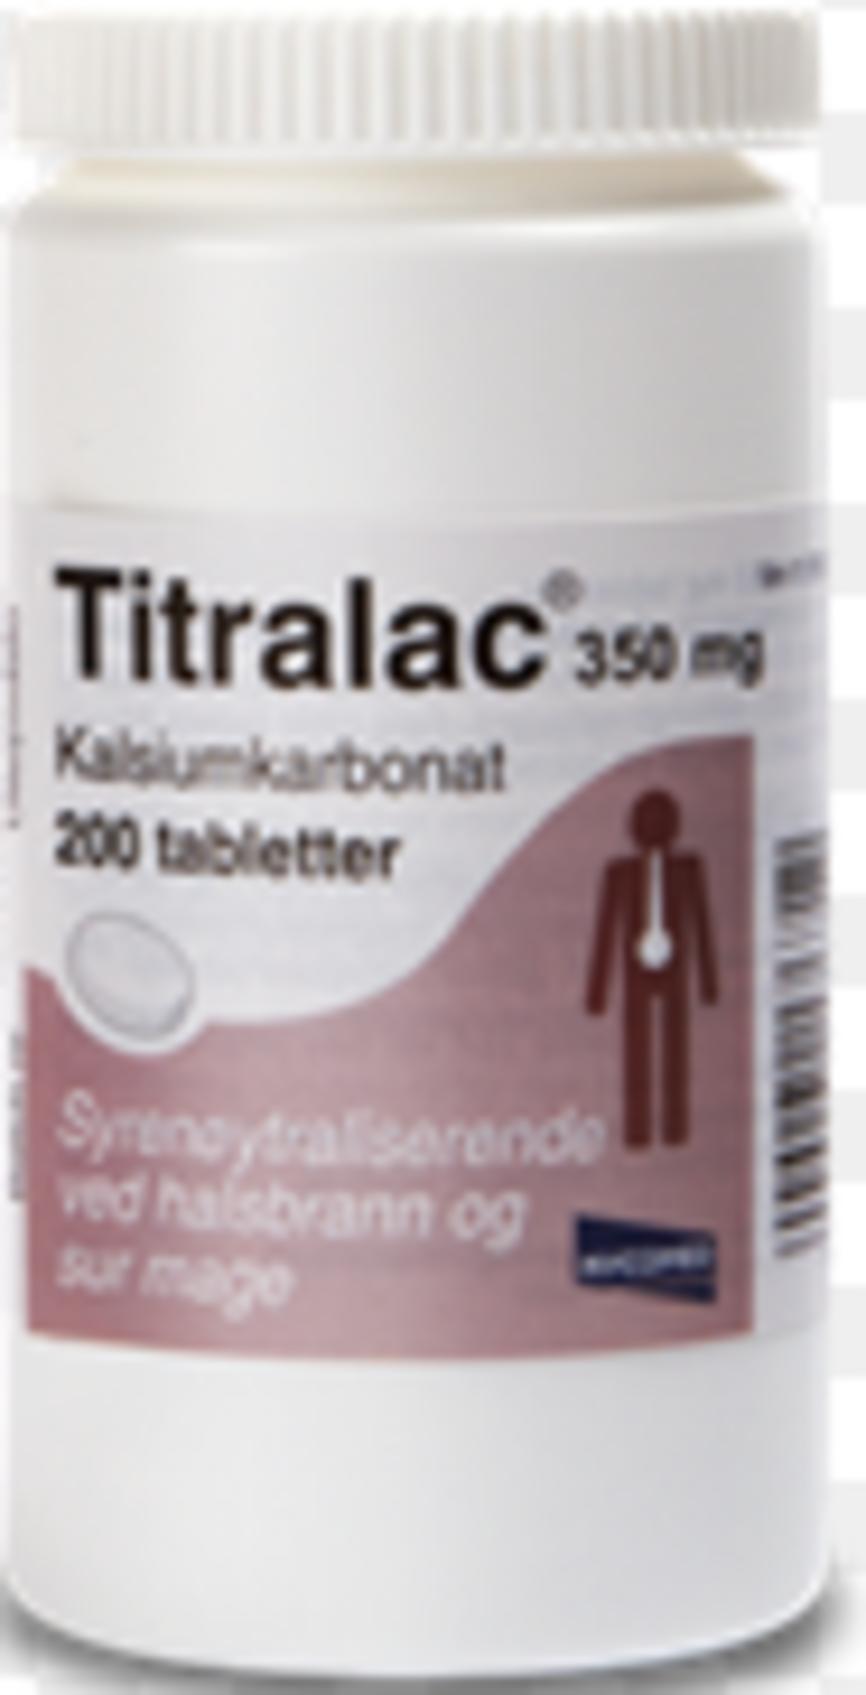 ab89997b Kjøp Titralac Tab 350 mg 200 stk på nett | Vitusapotek